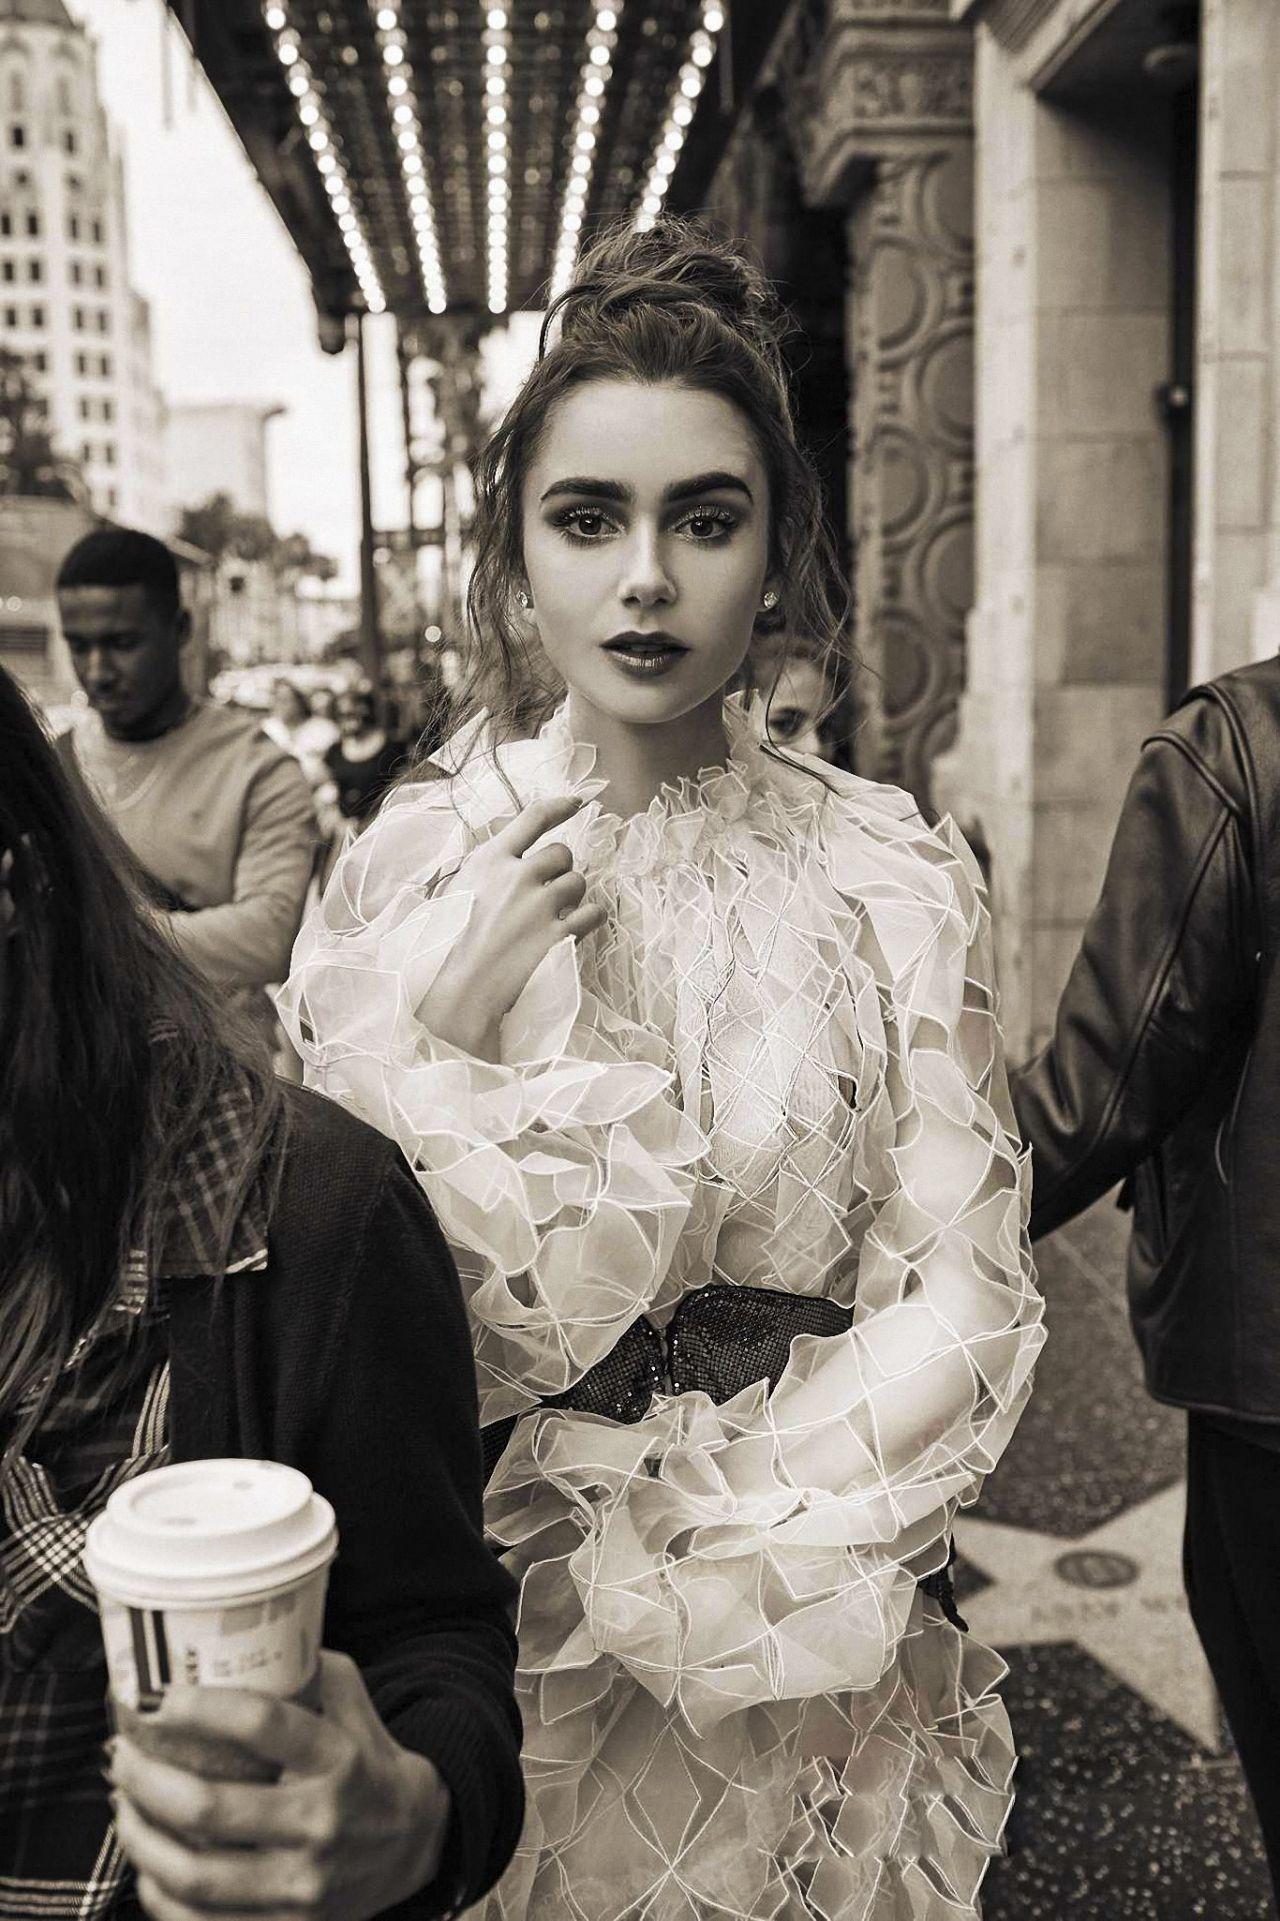 https://celebmafia.com/wp-content/uploads/2019/02/lily-collins-paper-magazine-february-2019-photoshoot-2.jpg